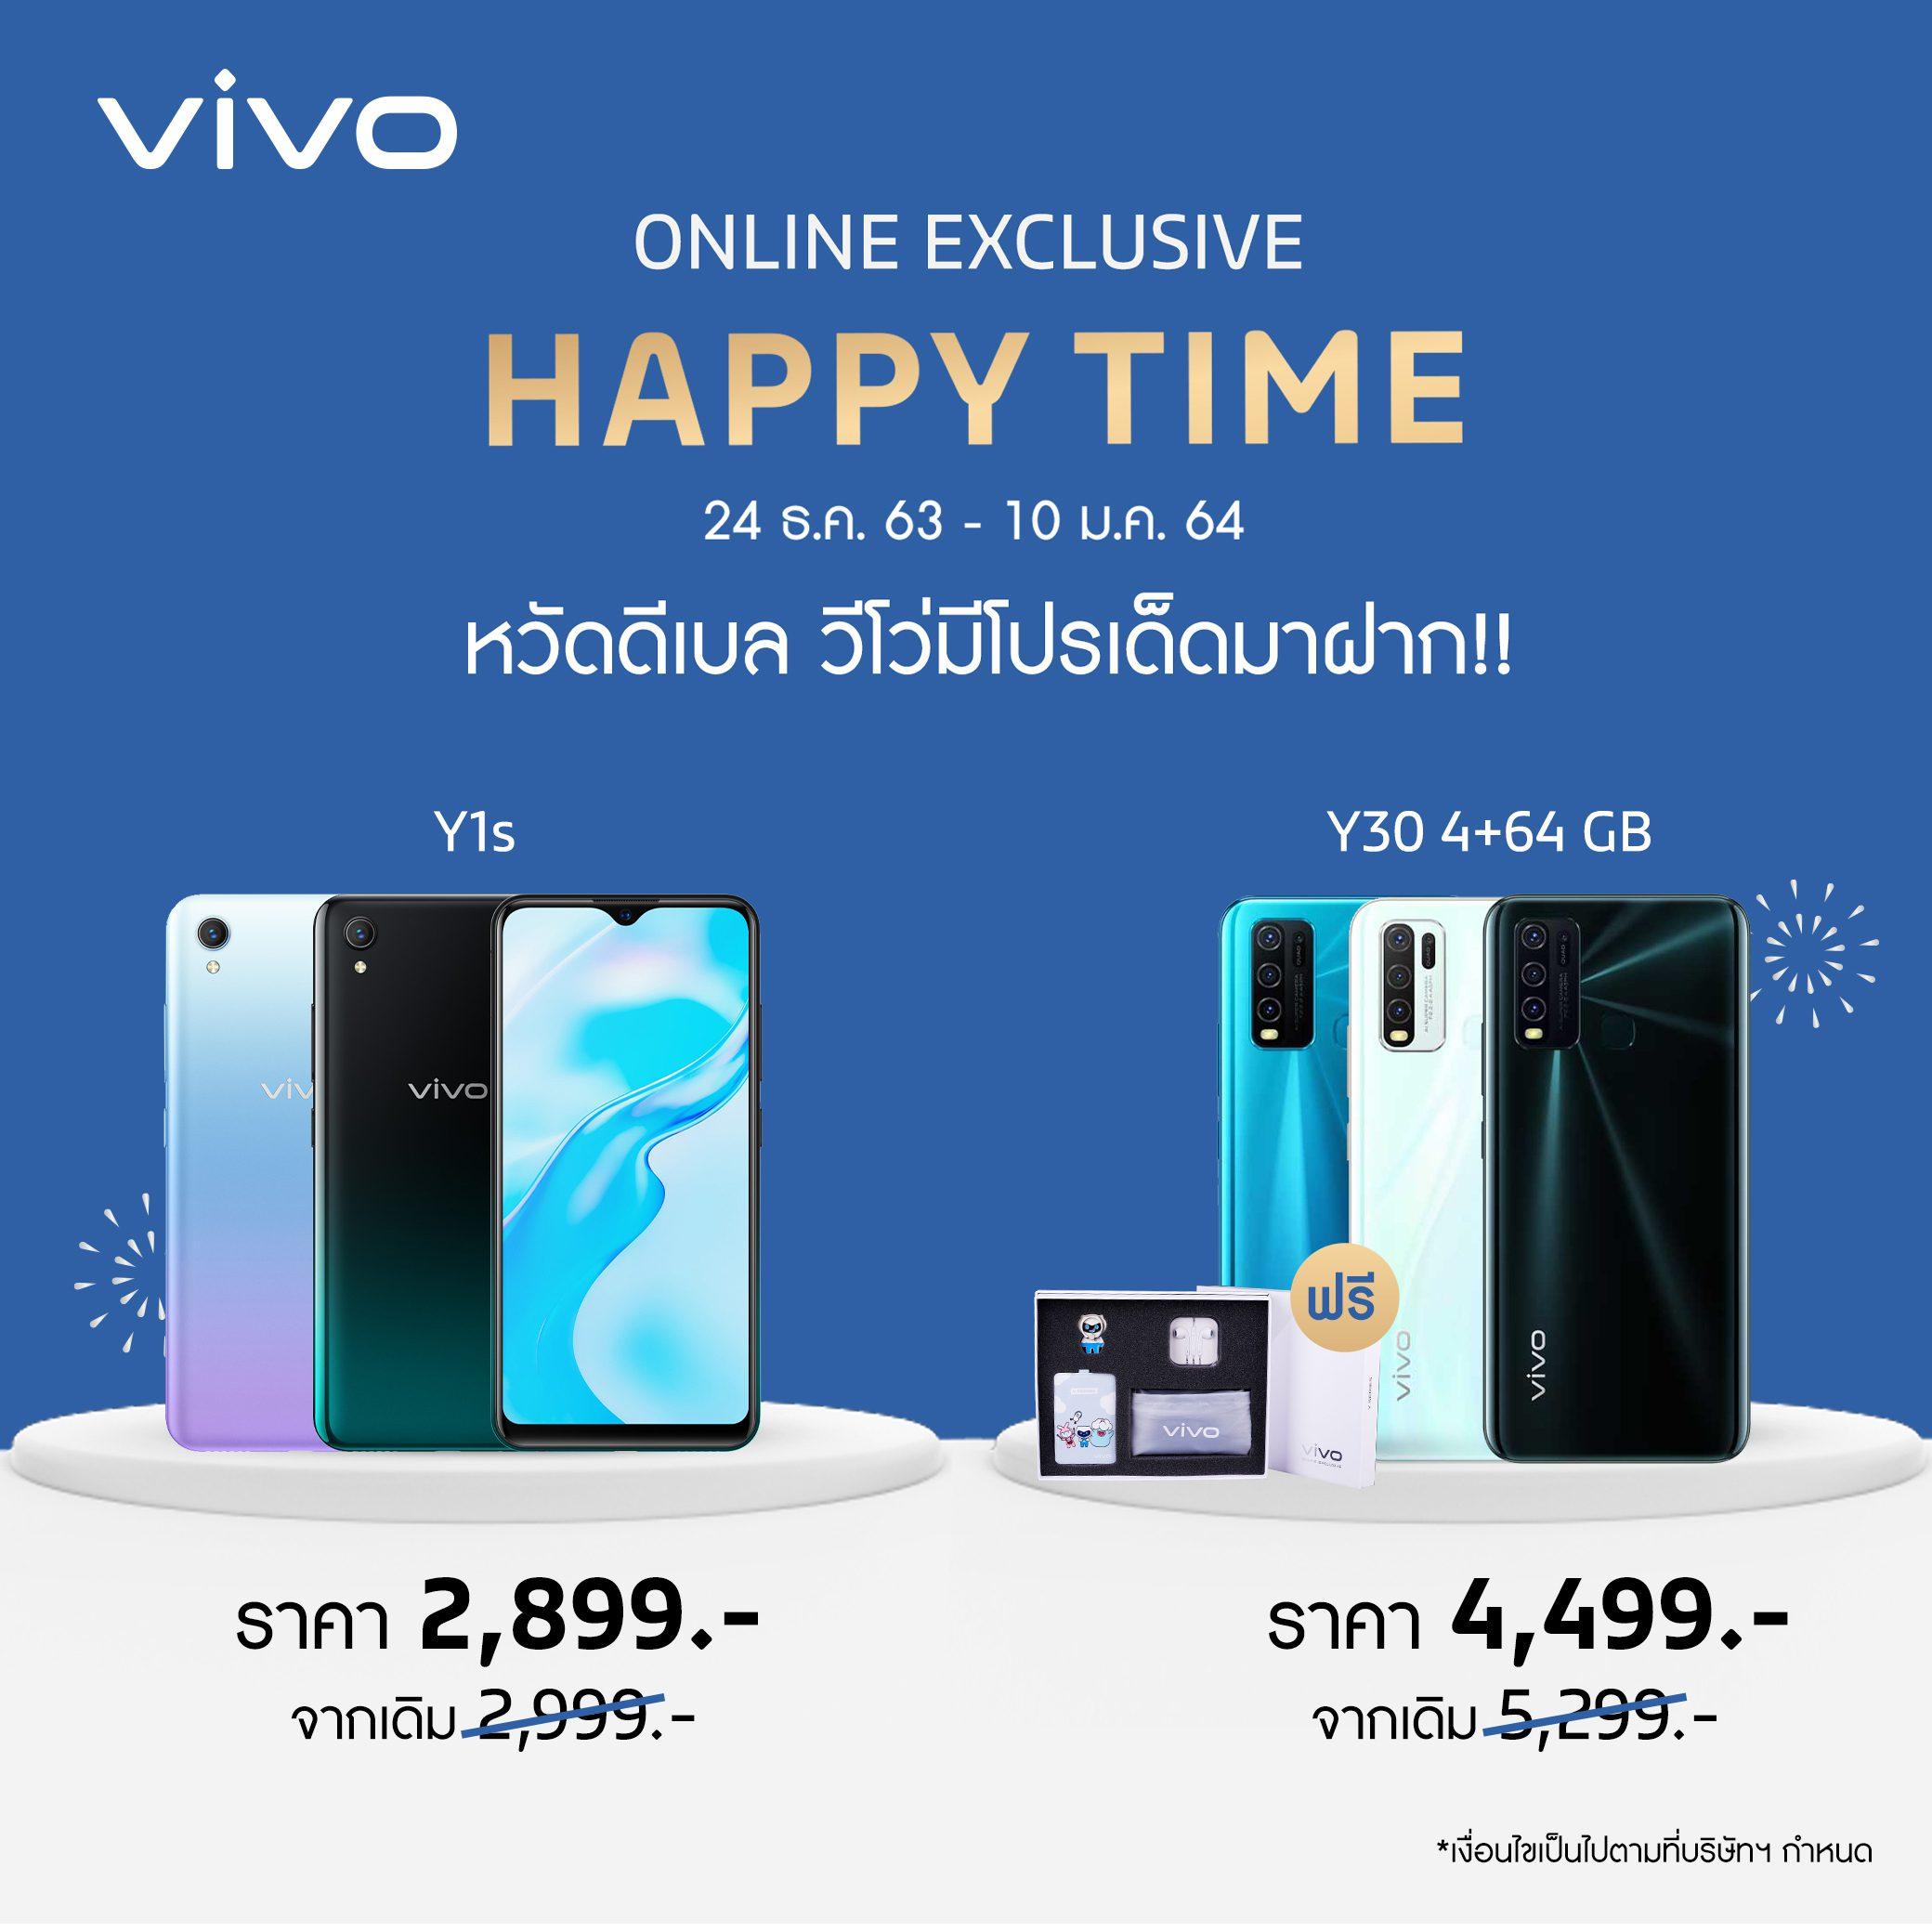 Vivo ฉลองเปิดร้าน Online store สุดยิ่งใหญ่ พร้อมรับโปรโมชั่นต่างๆมากมาย